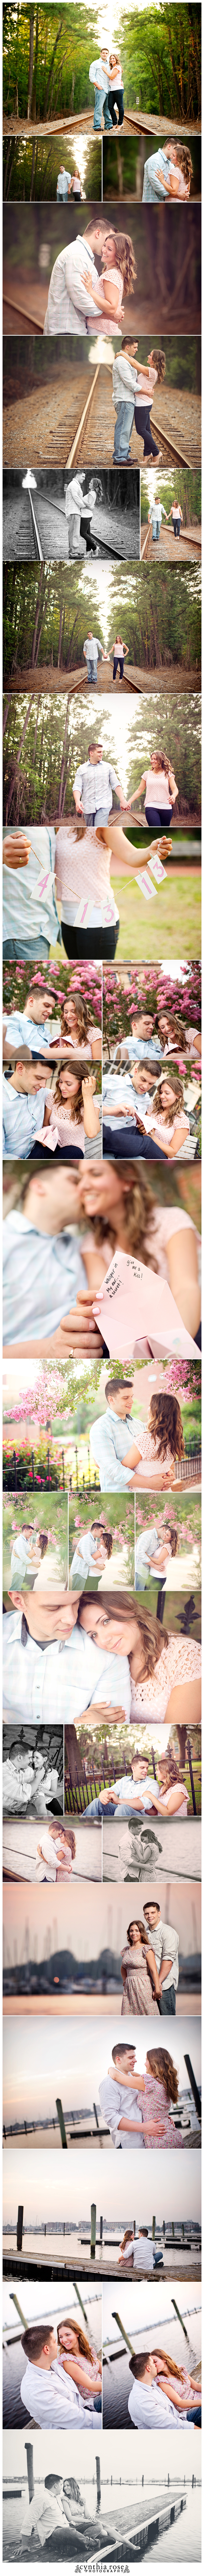 New Bern NC wedding photographer